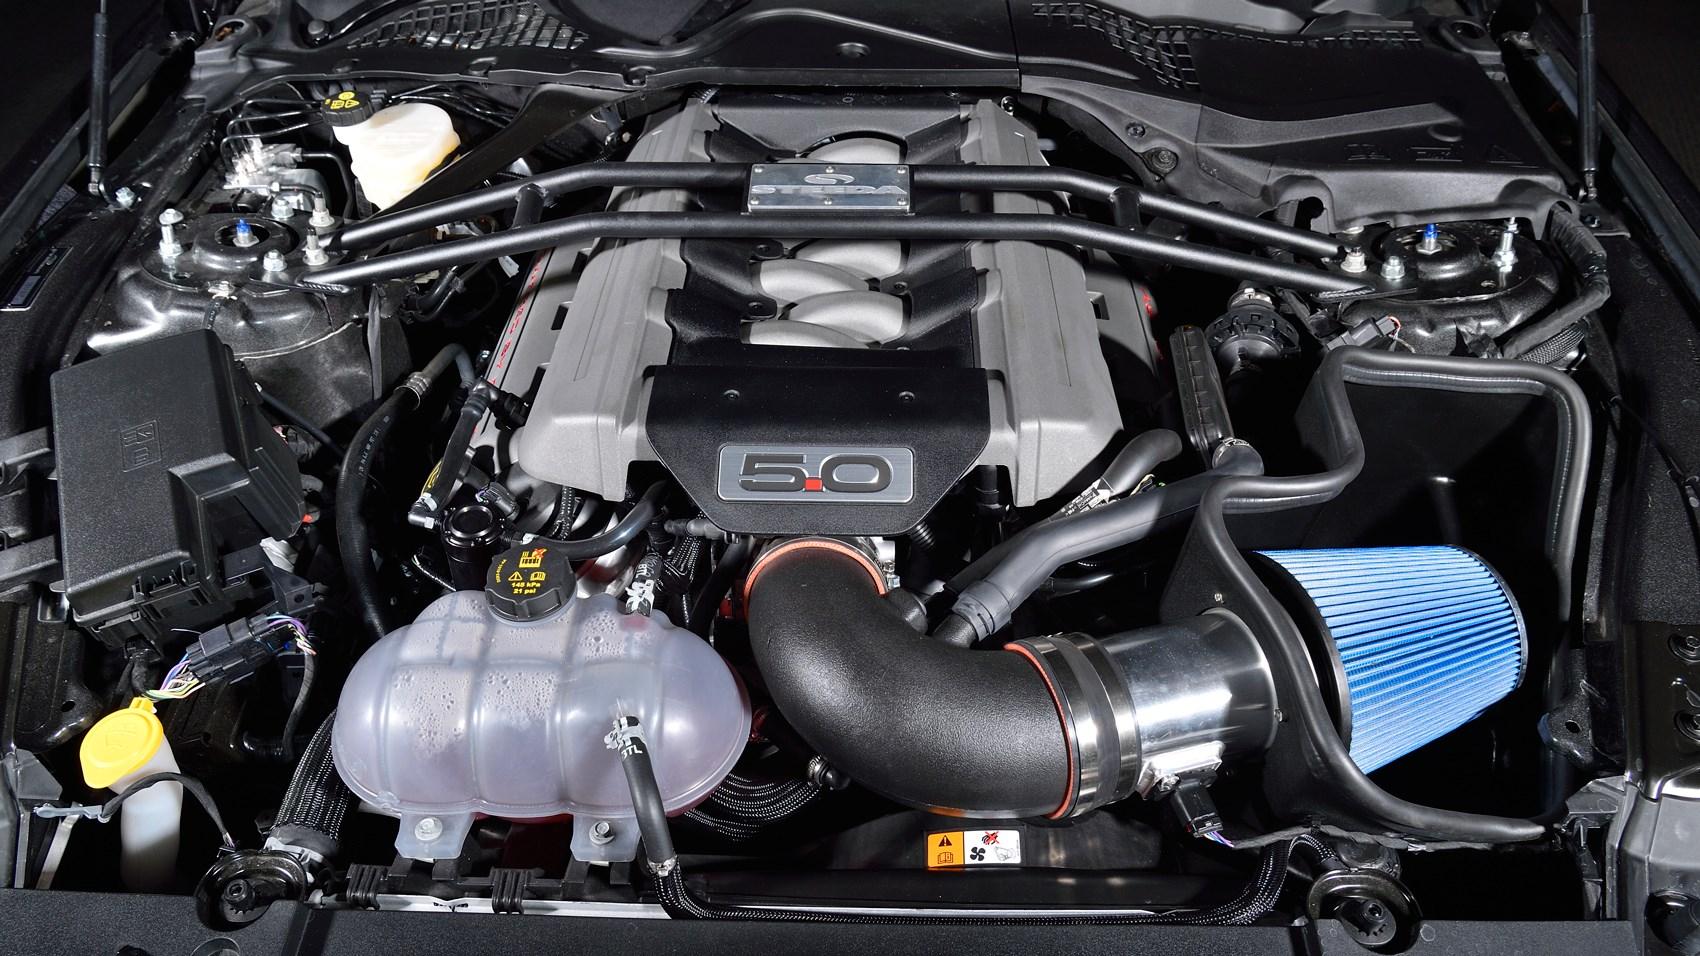 Steeda Q500 engine